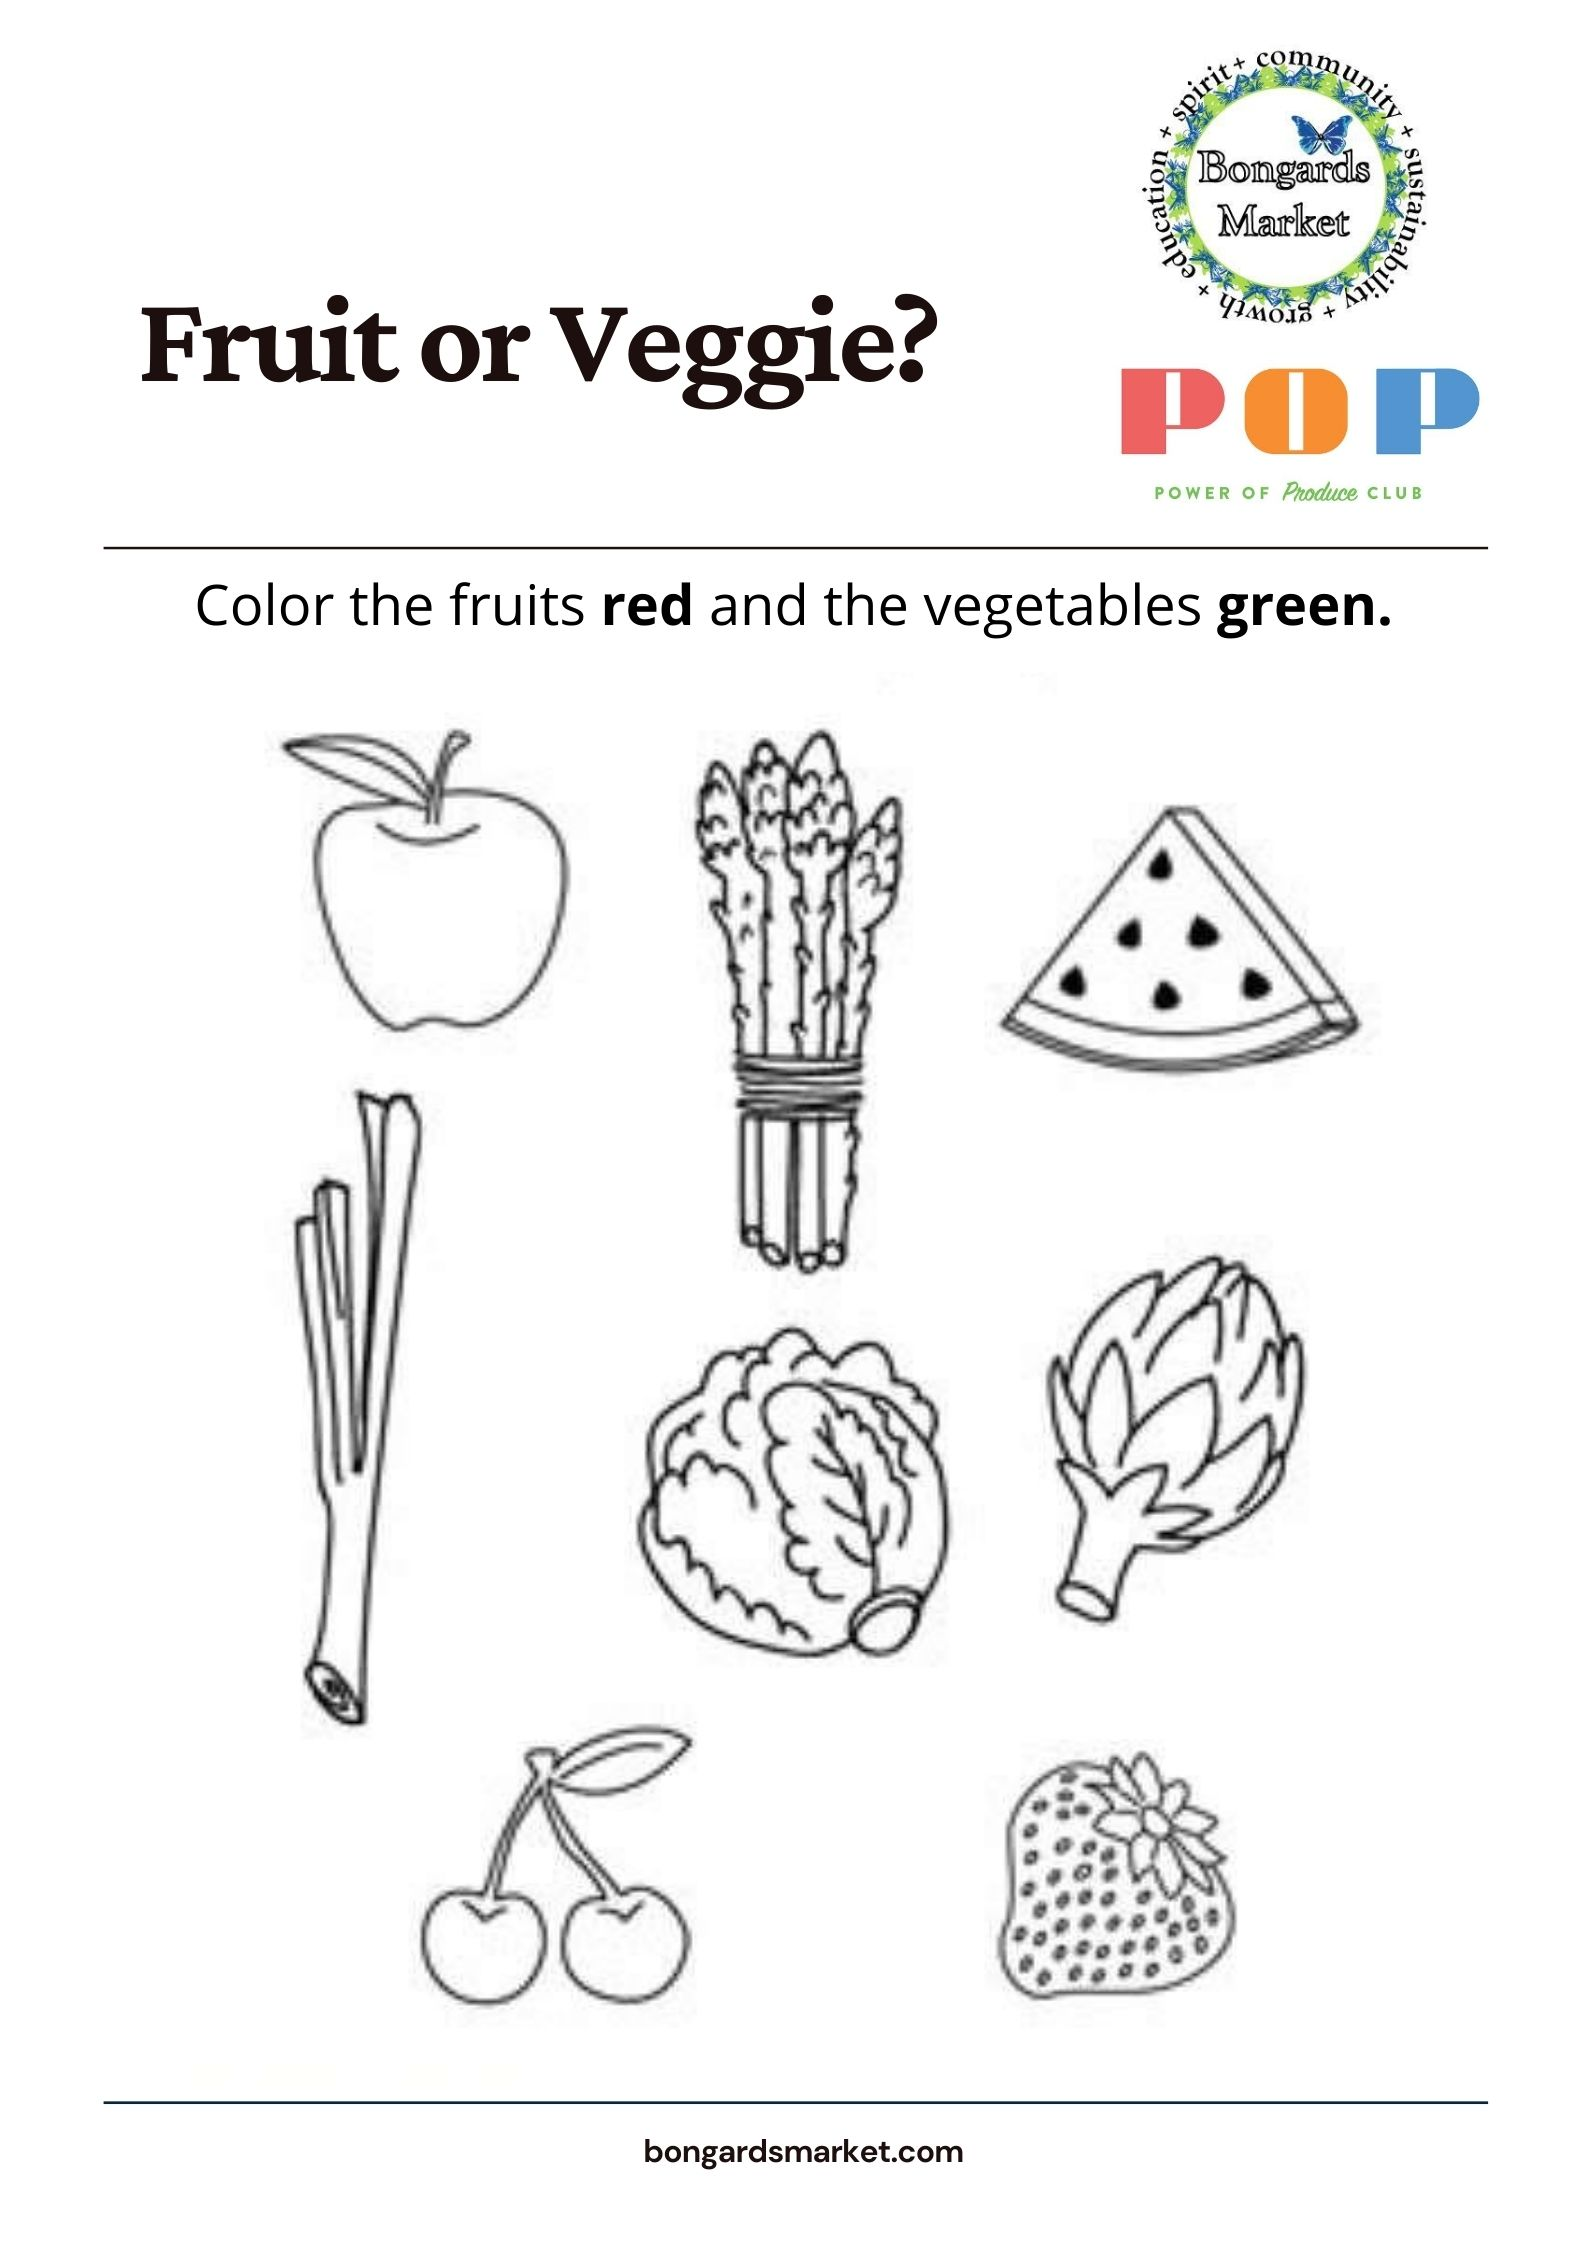 PoP Club Fruit or Veggie